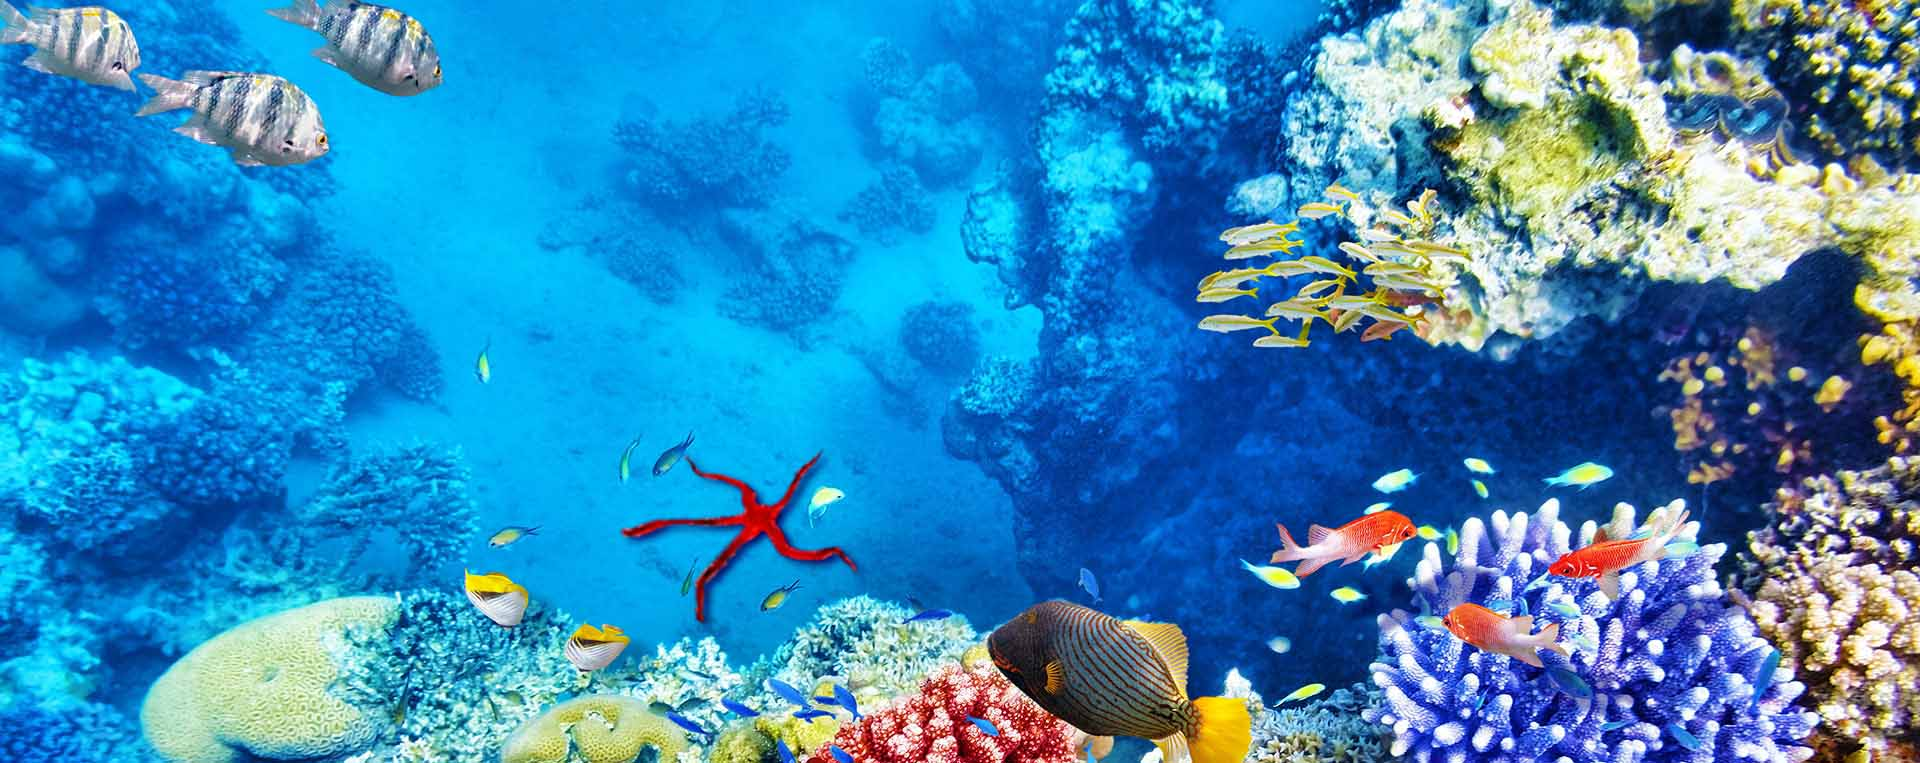 Mořské akvárium Mořský útes